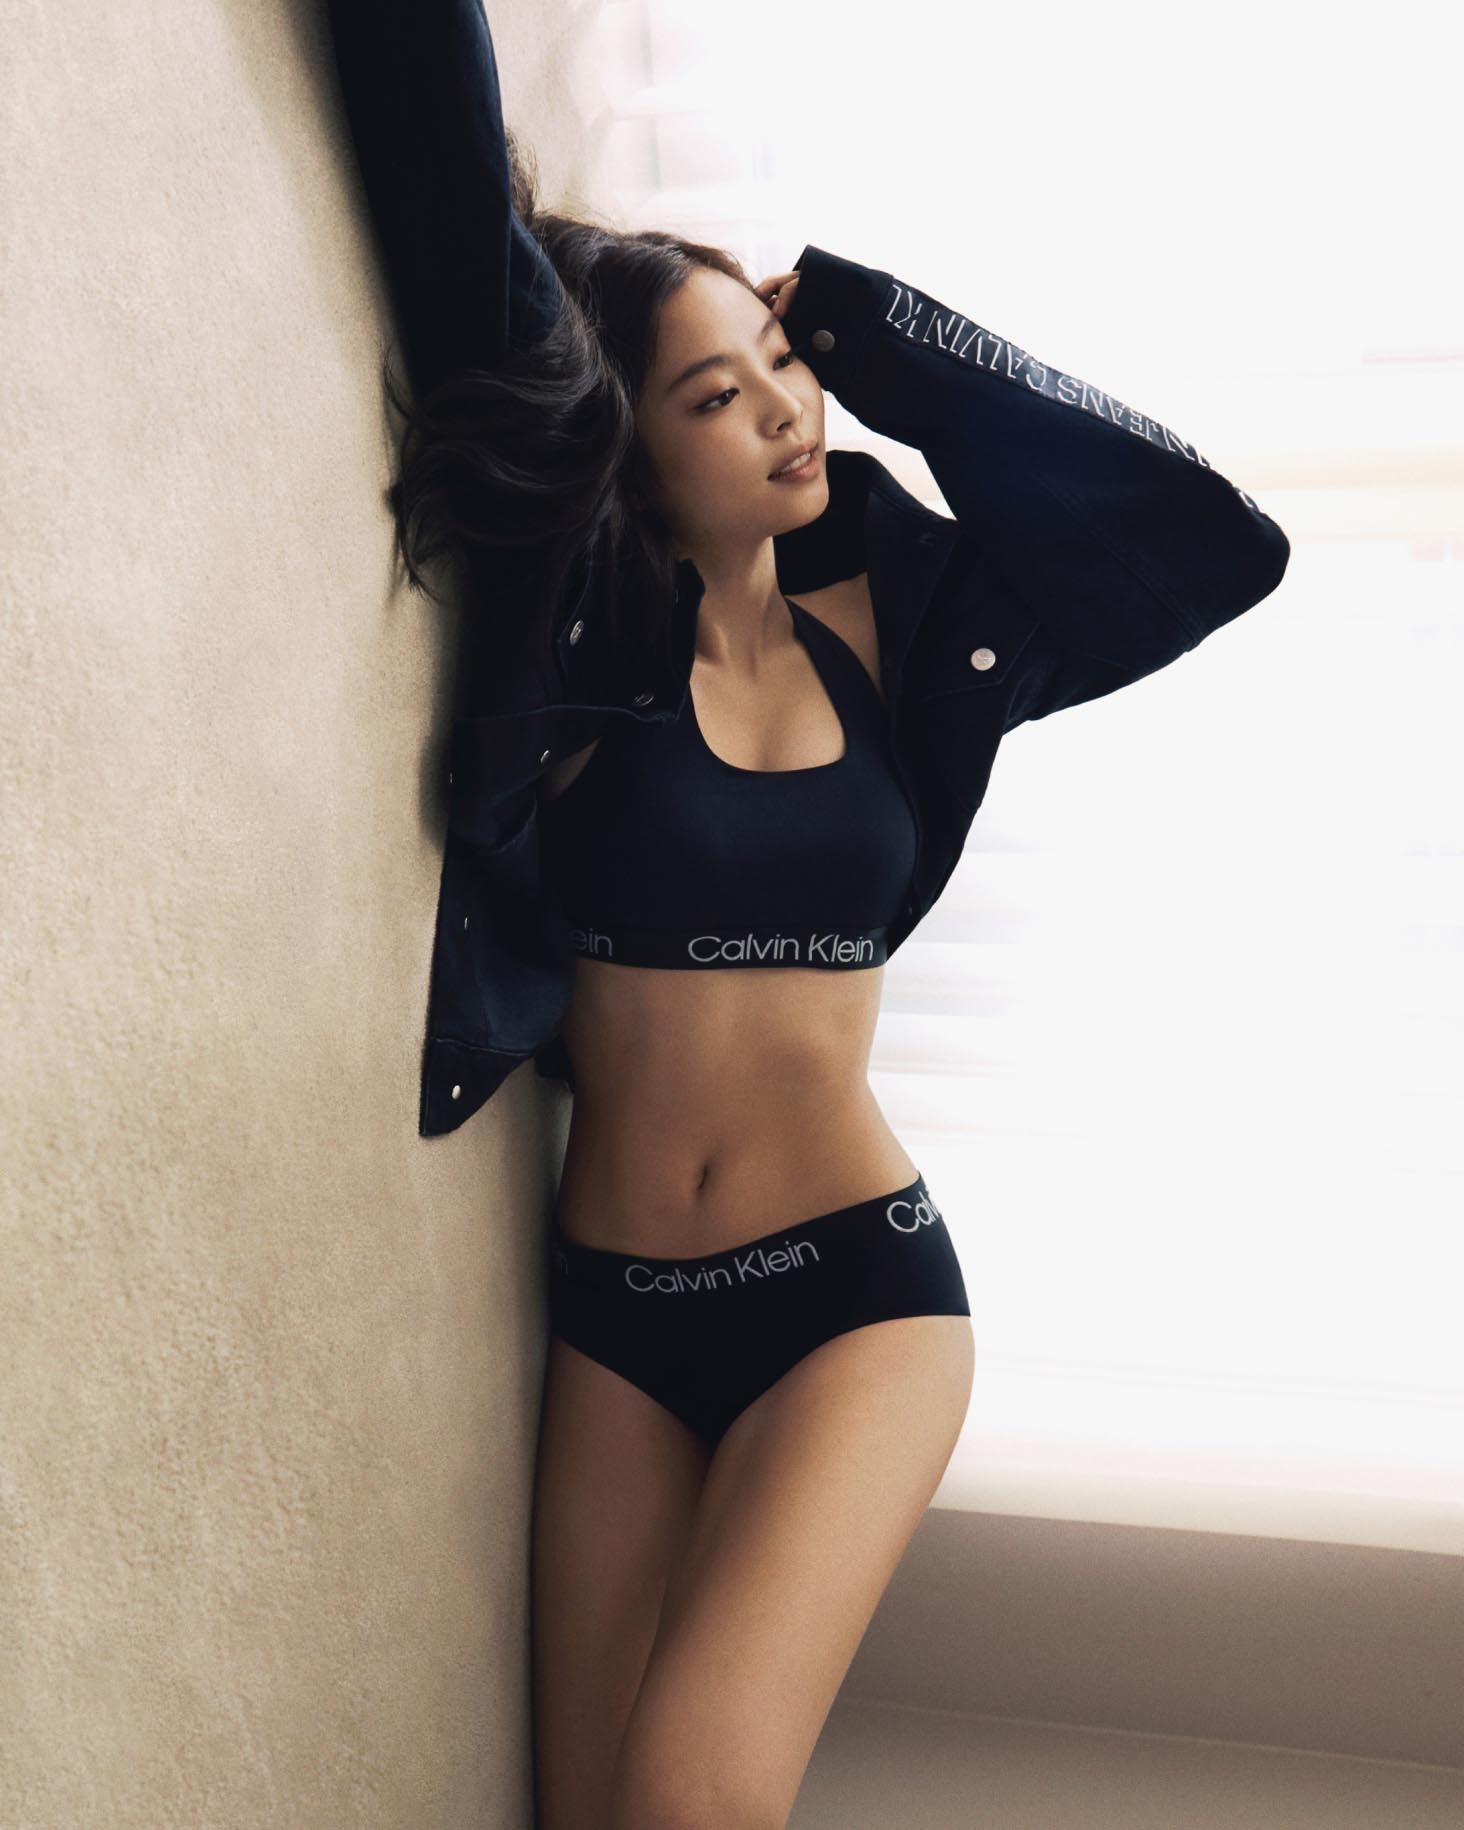 Jennie Blackpink Jadi Model Kampanye Calvin Klein